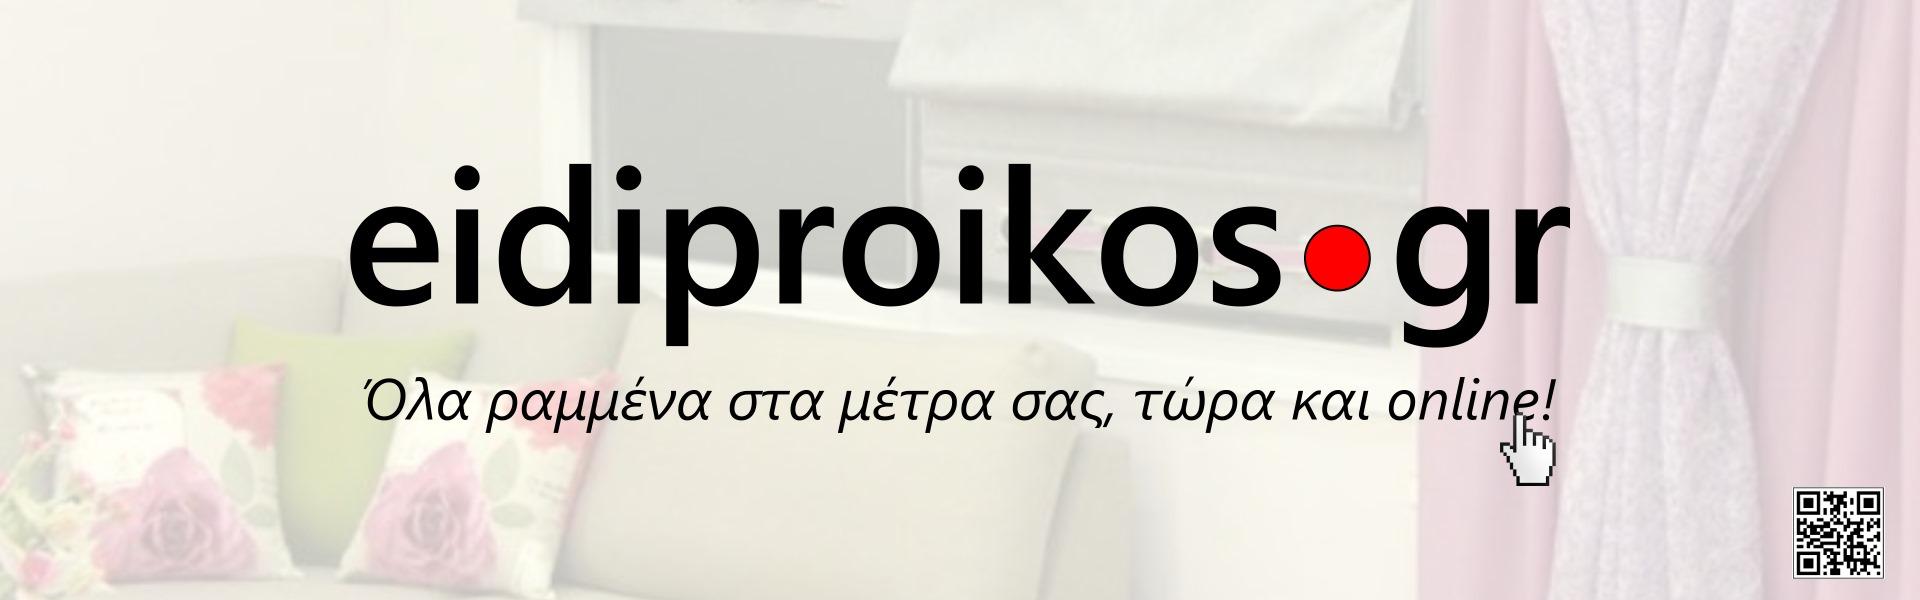 Eidiproikos.gr